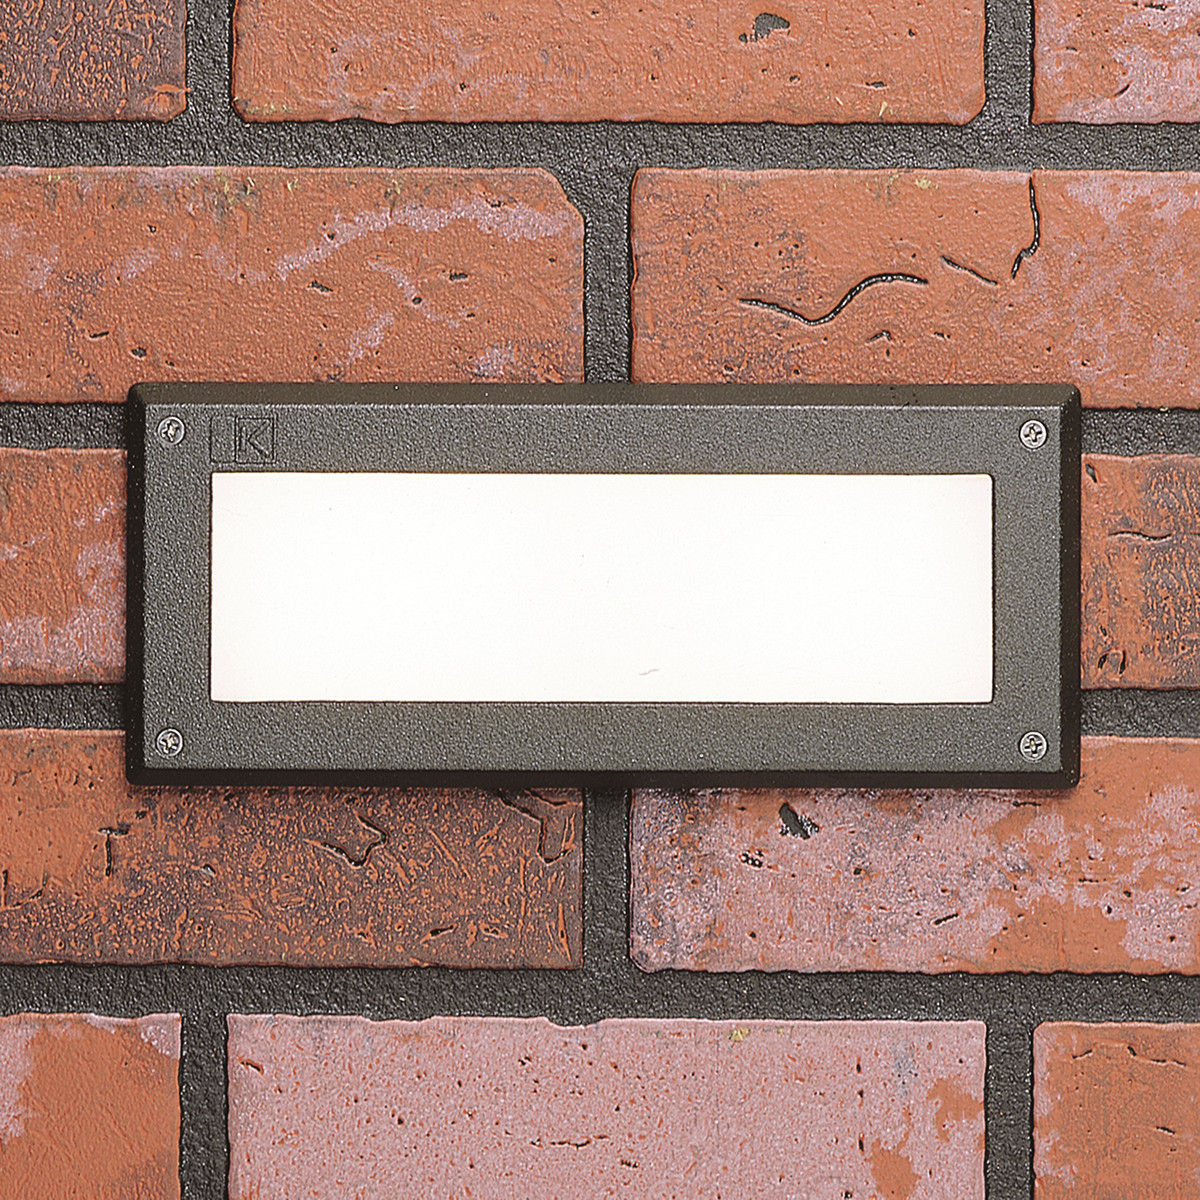 9.5  LED Luz De Ladrillo Kichler 15774-27 con lente de cristal blancoo - 2700K-Bronce